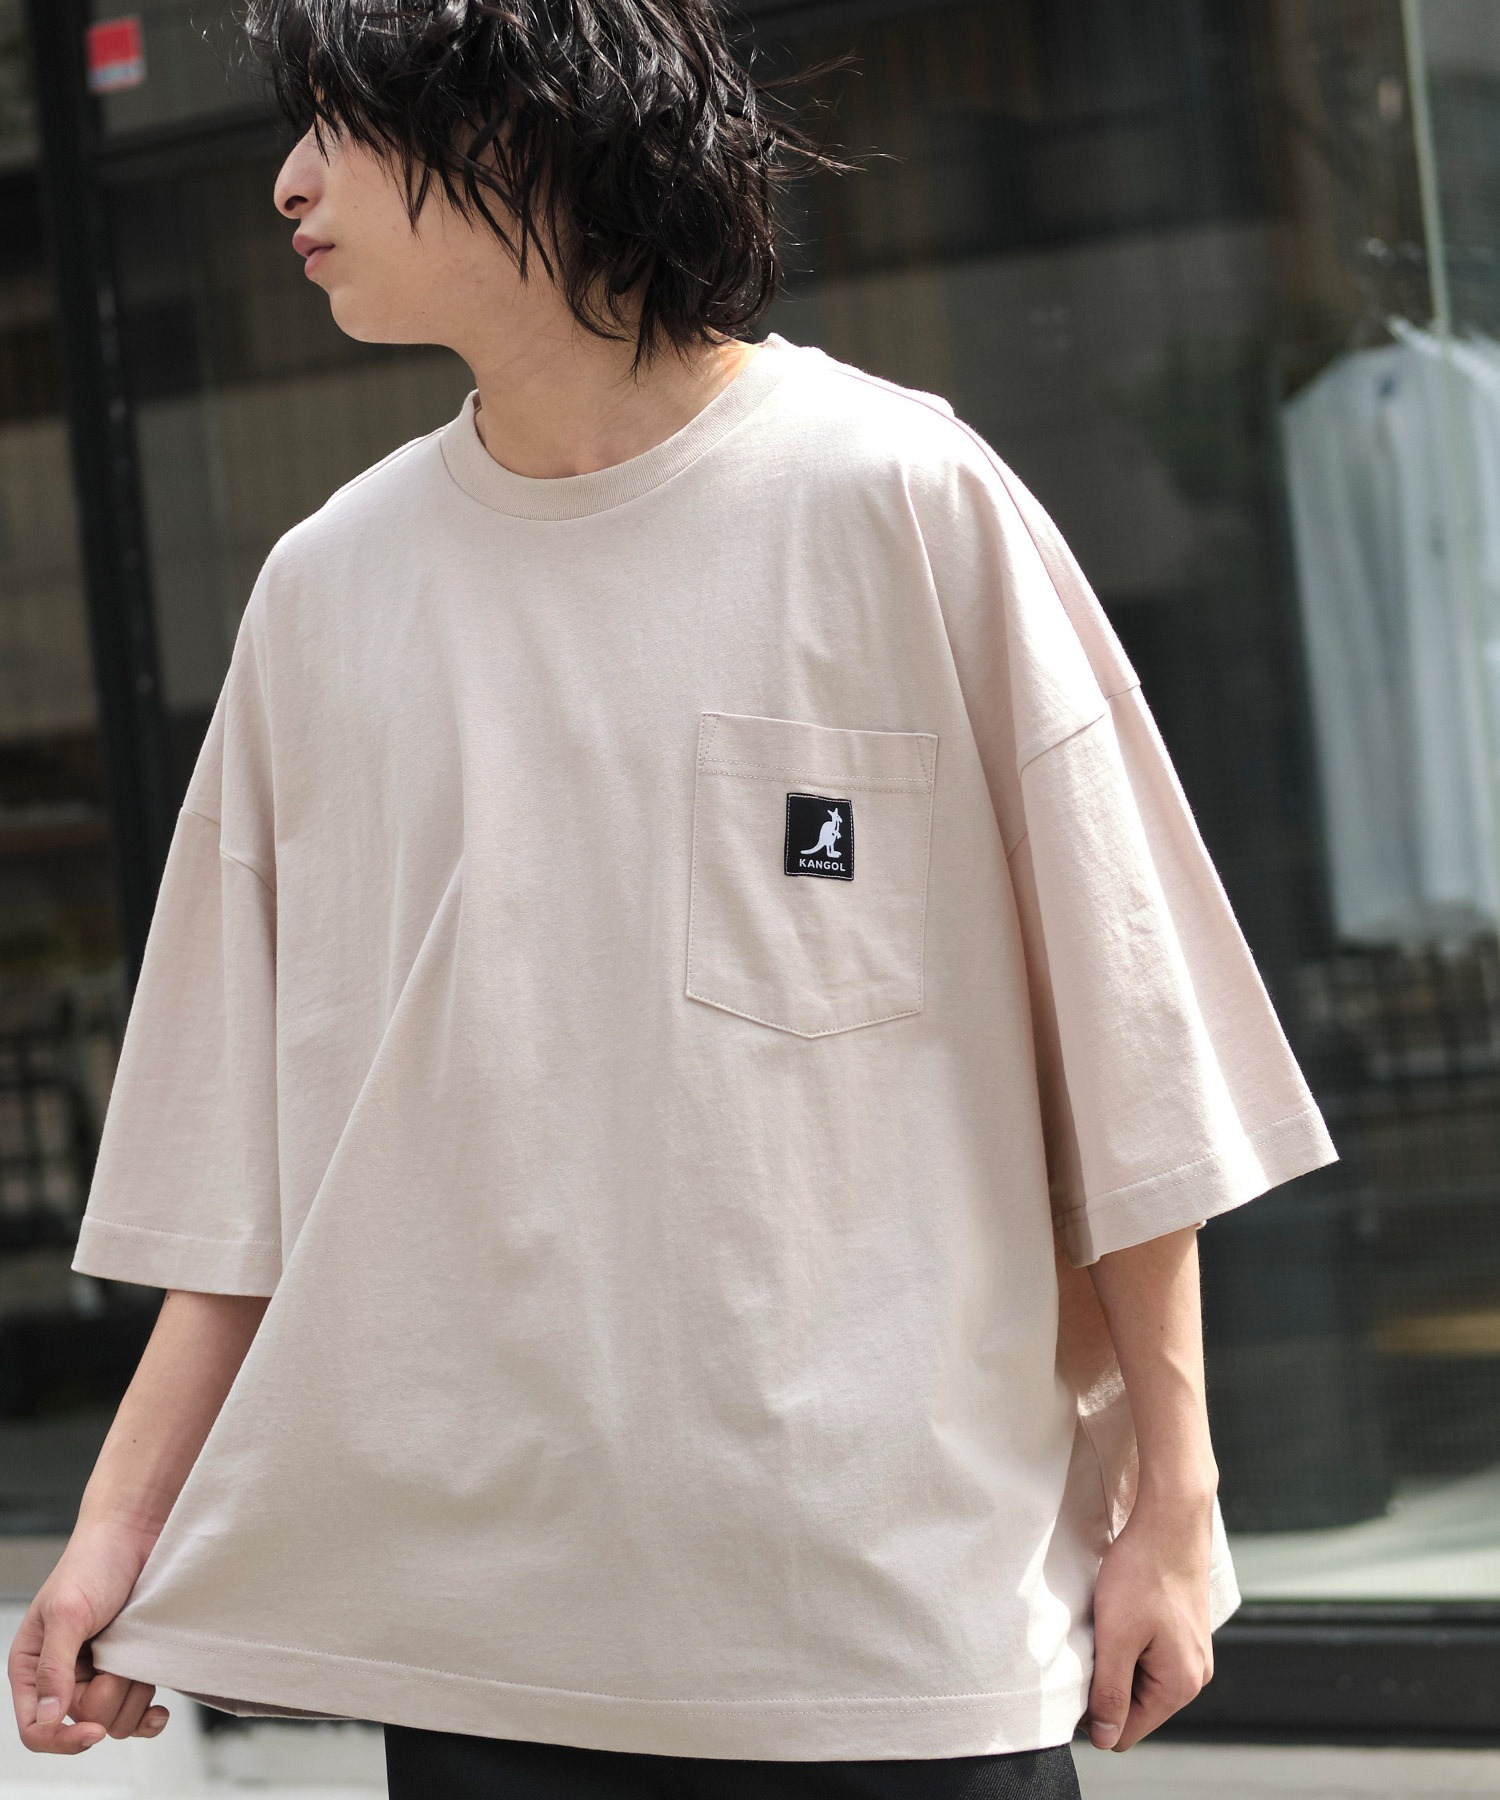 KANGOL/カンゴール 別注 ビッグシルエット ロゴピスネーム ポケット半袖Tシャツ 無地T トップス Tシャツ